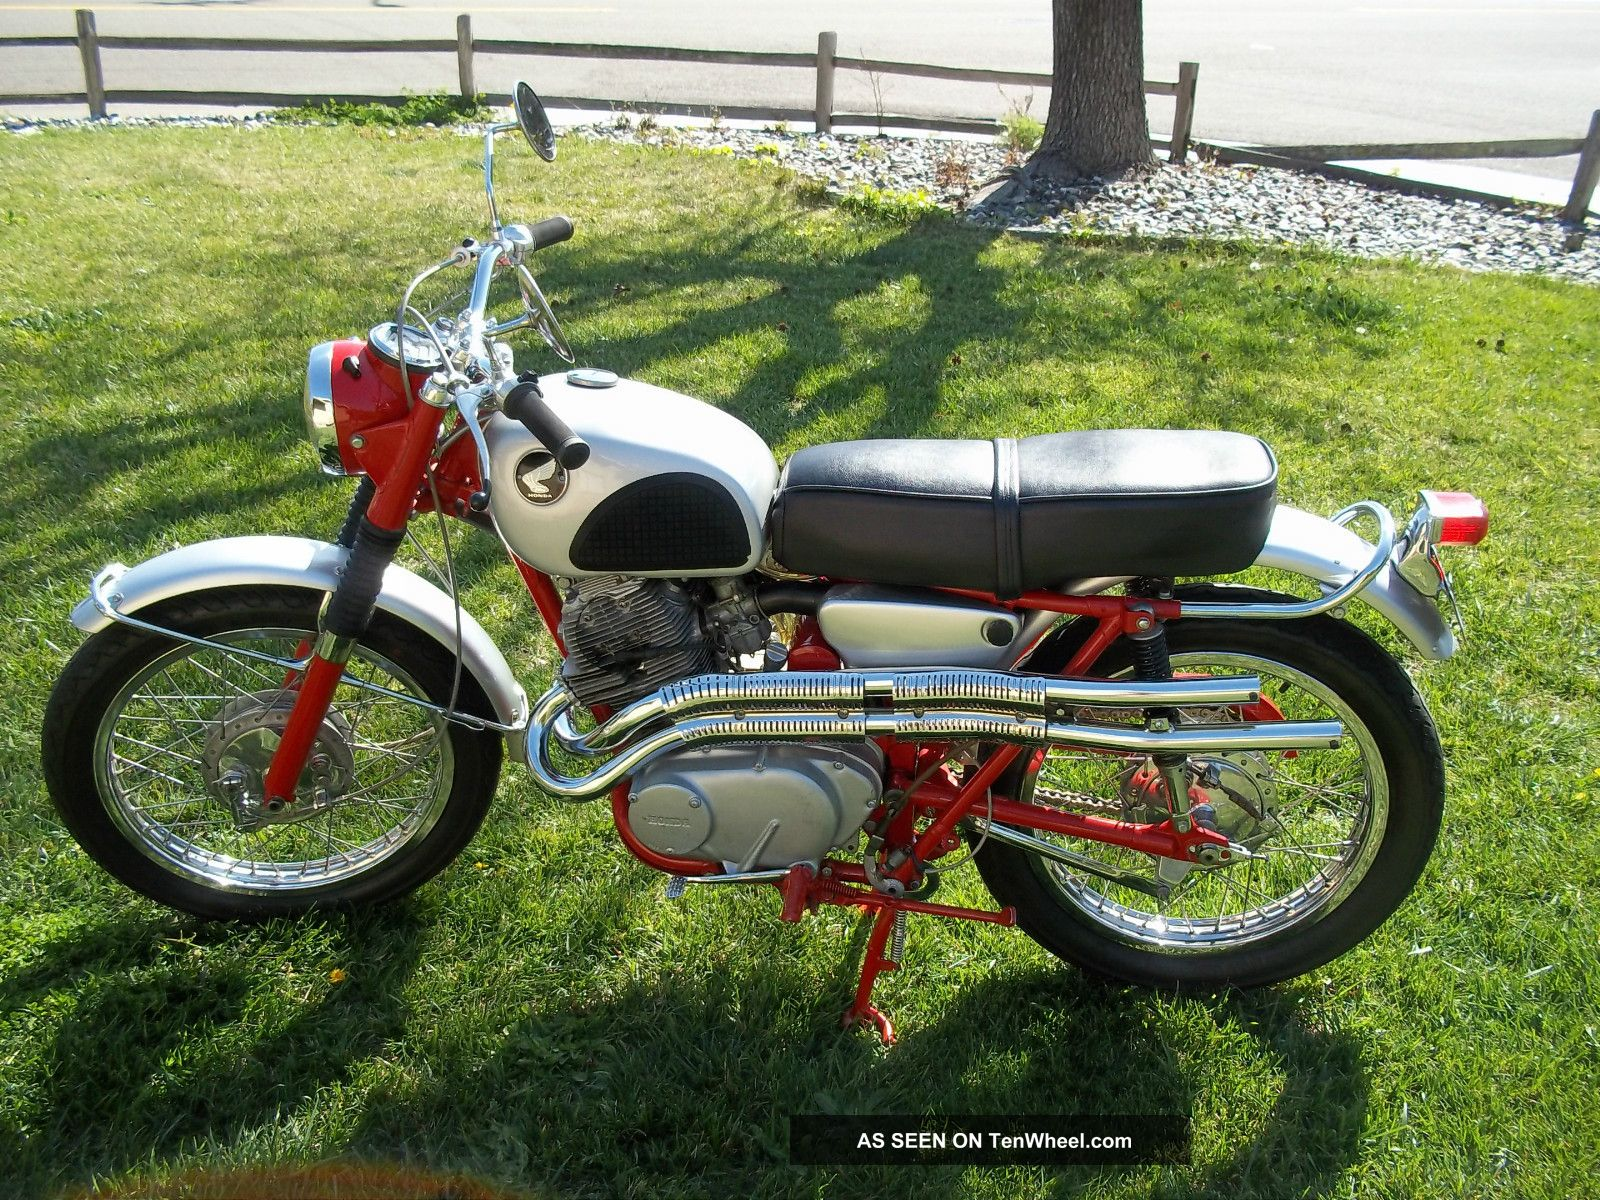 Craigslist Wausau Cars >> 1965 Honda 305 scrambler for sale